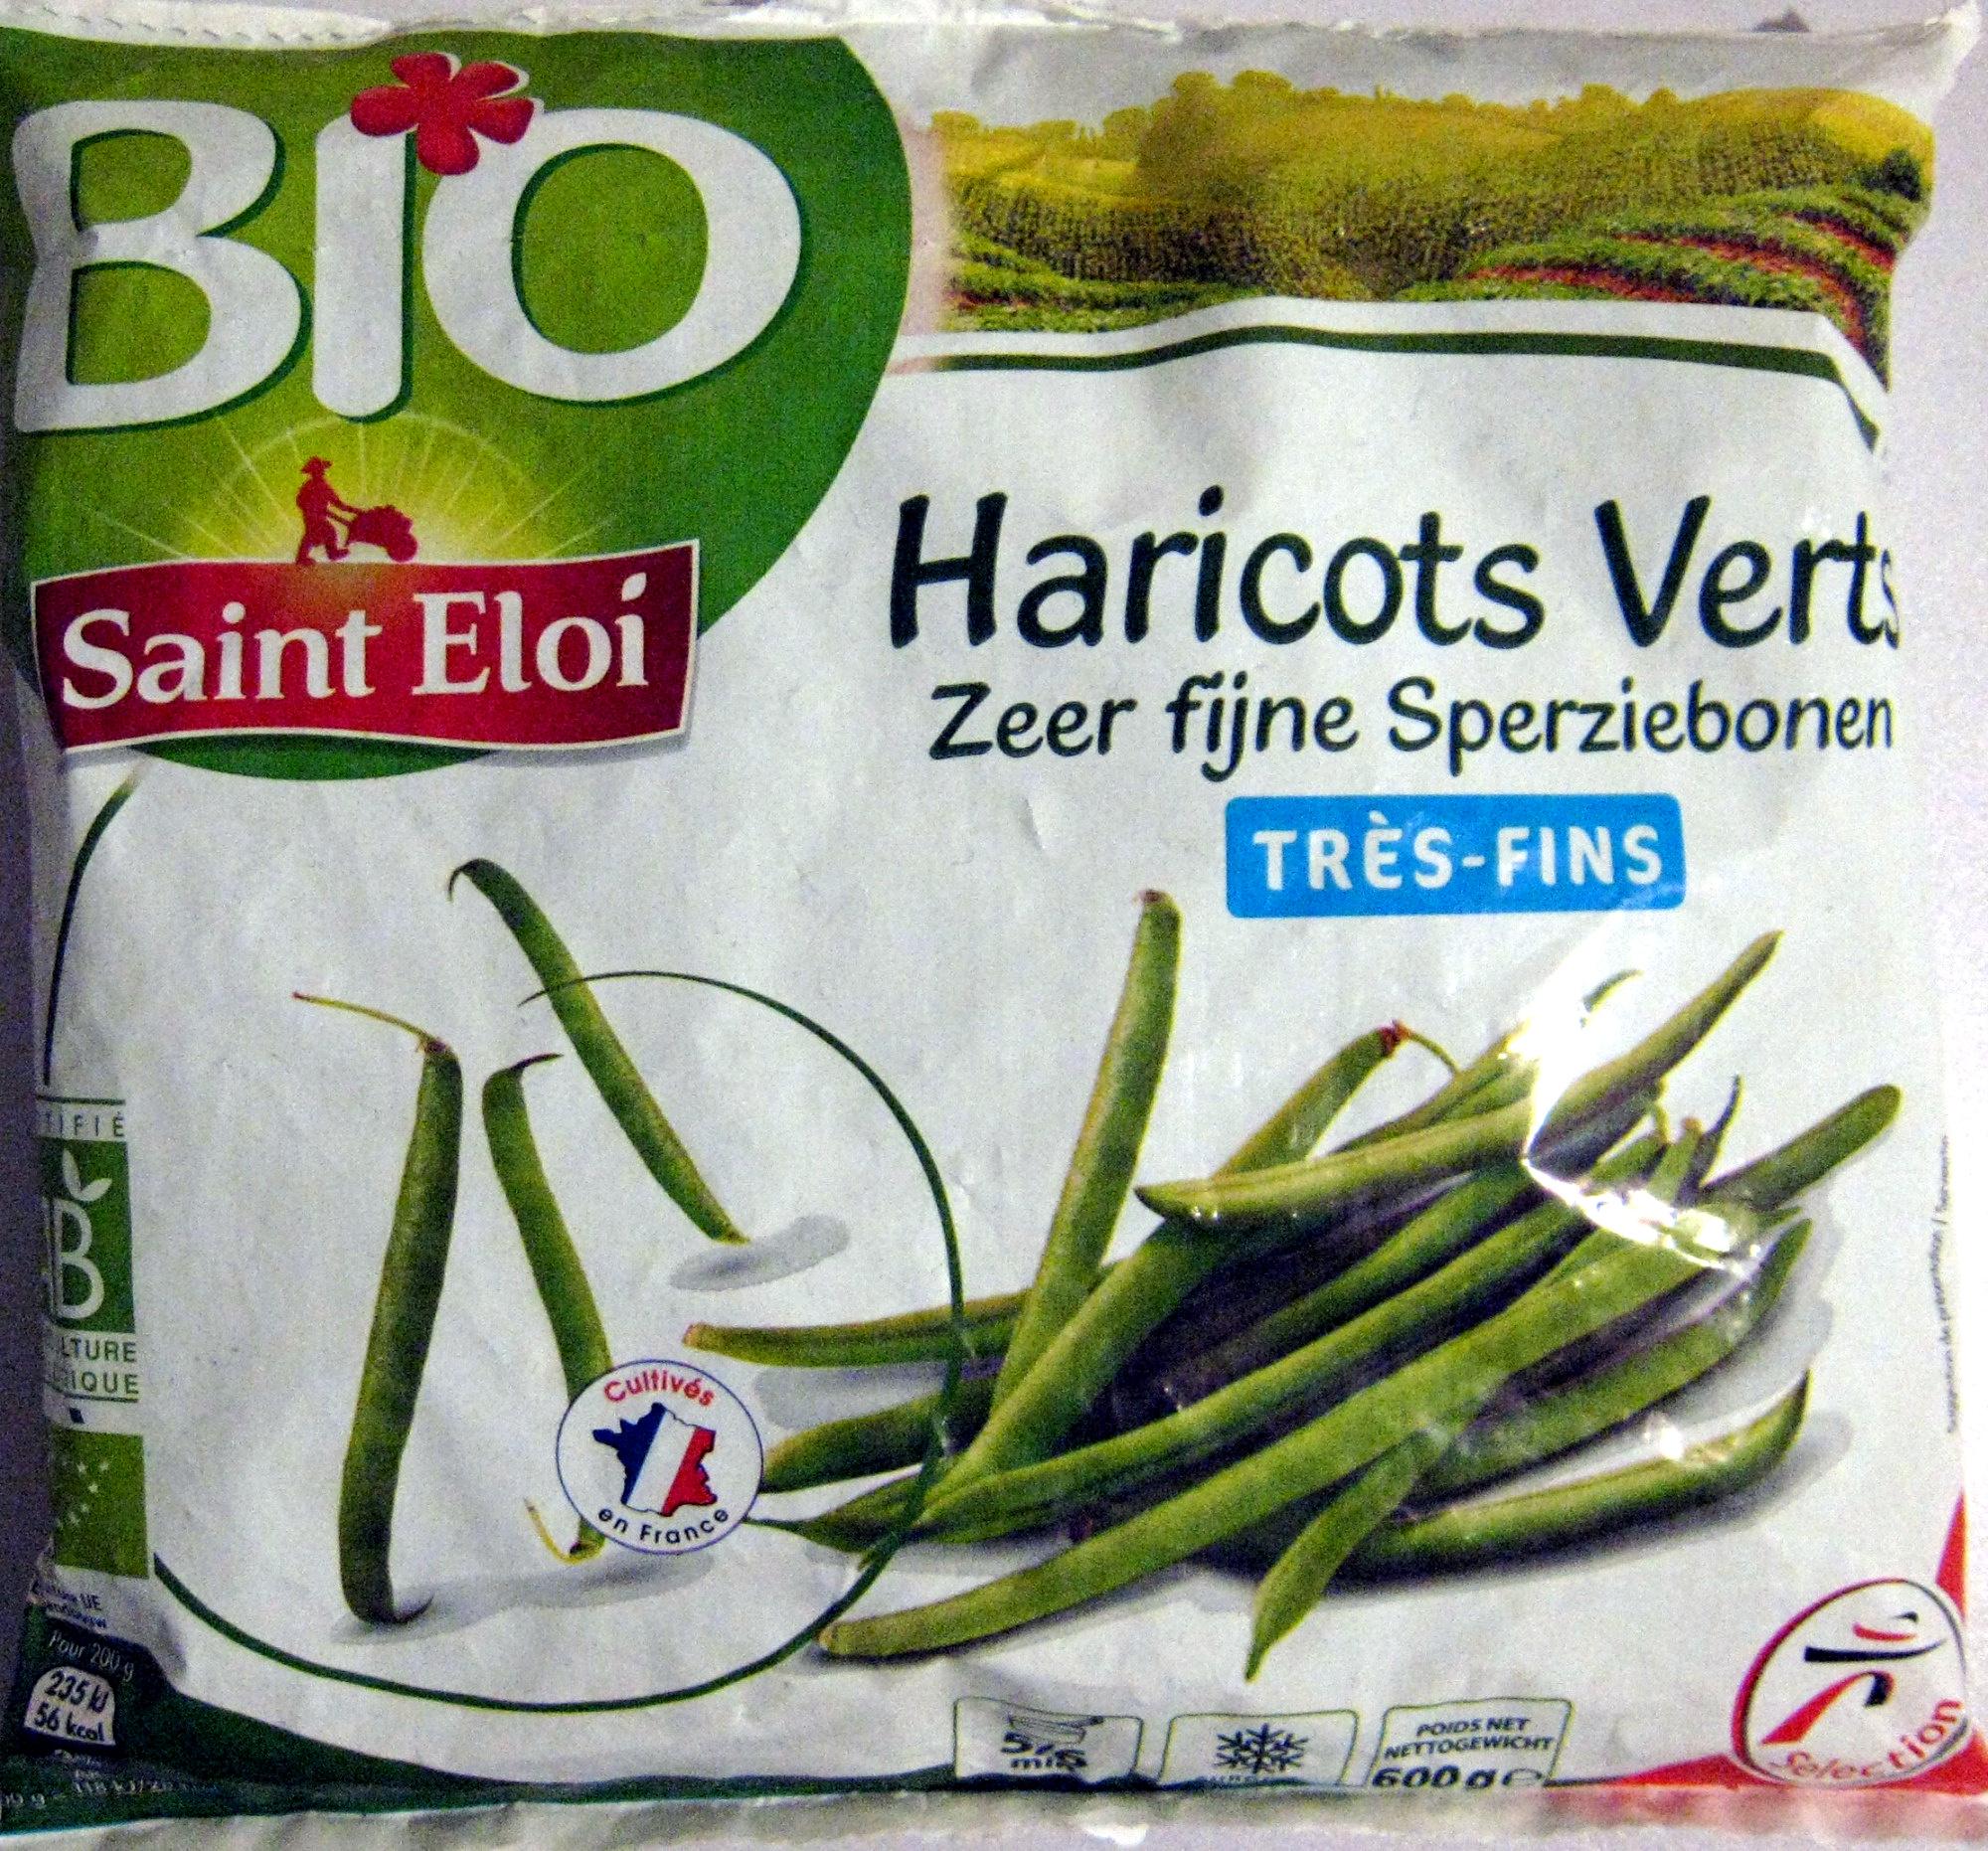 haricots verts tr s fins surgel s bio saint eloi 600 g. Black Bedroom Furniture Sets. Home Design Ideas